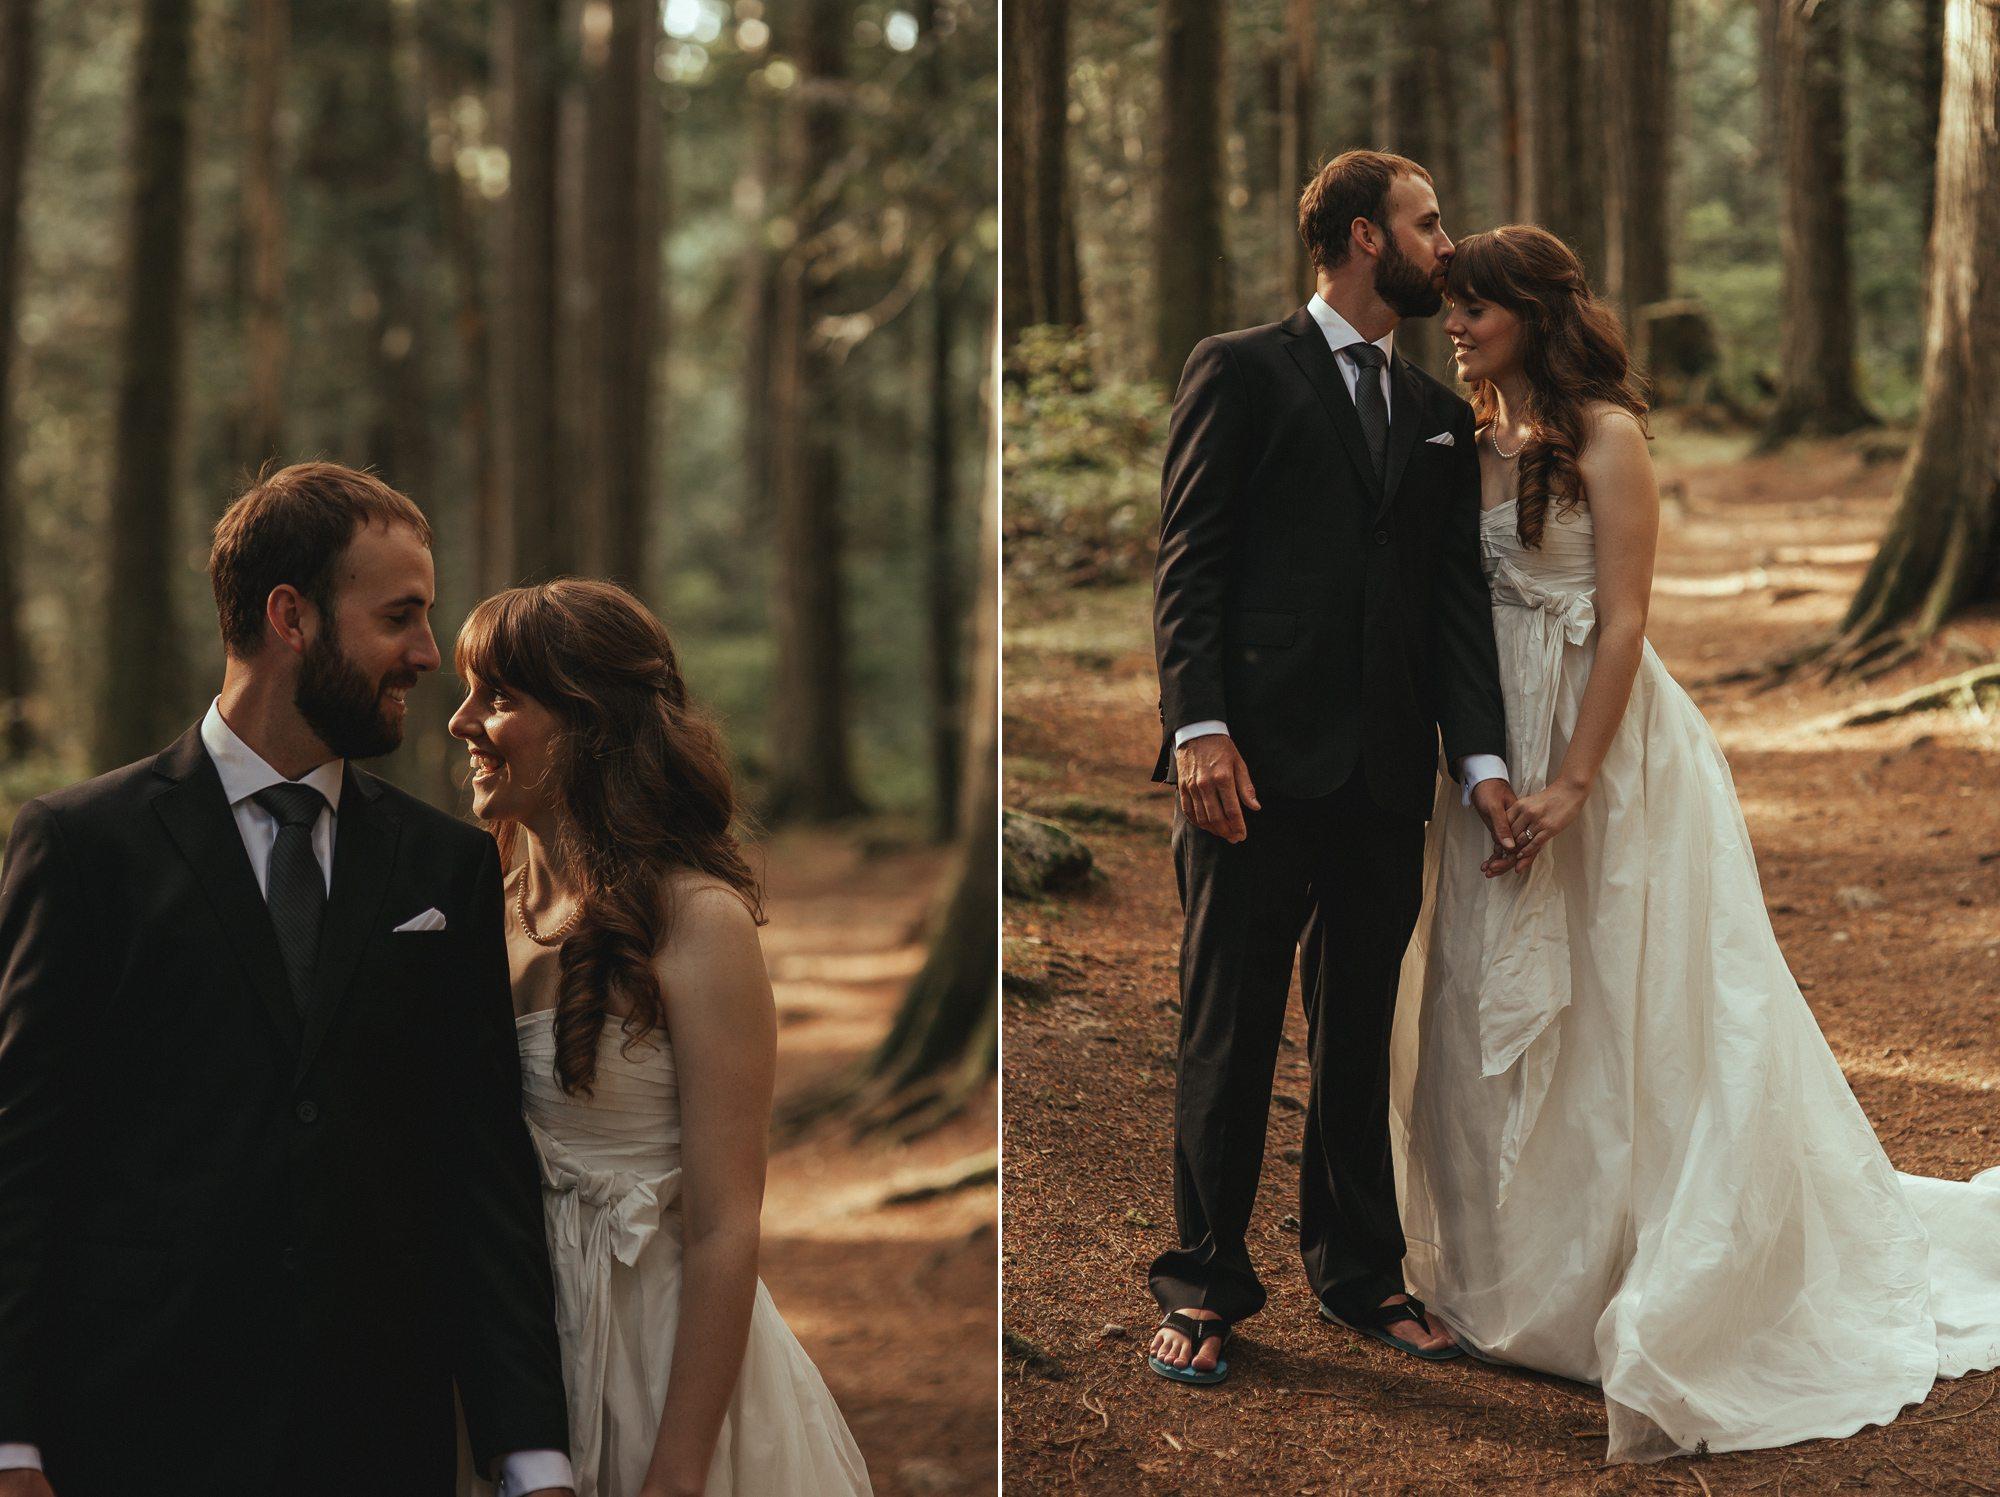 gibsons-wedding-photography-robert-devon34